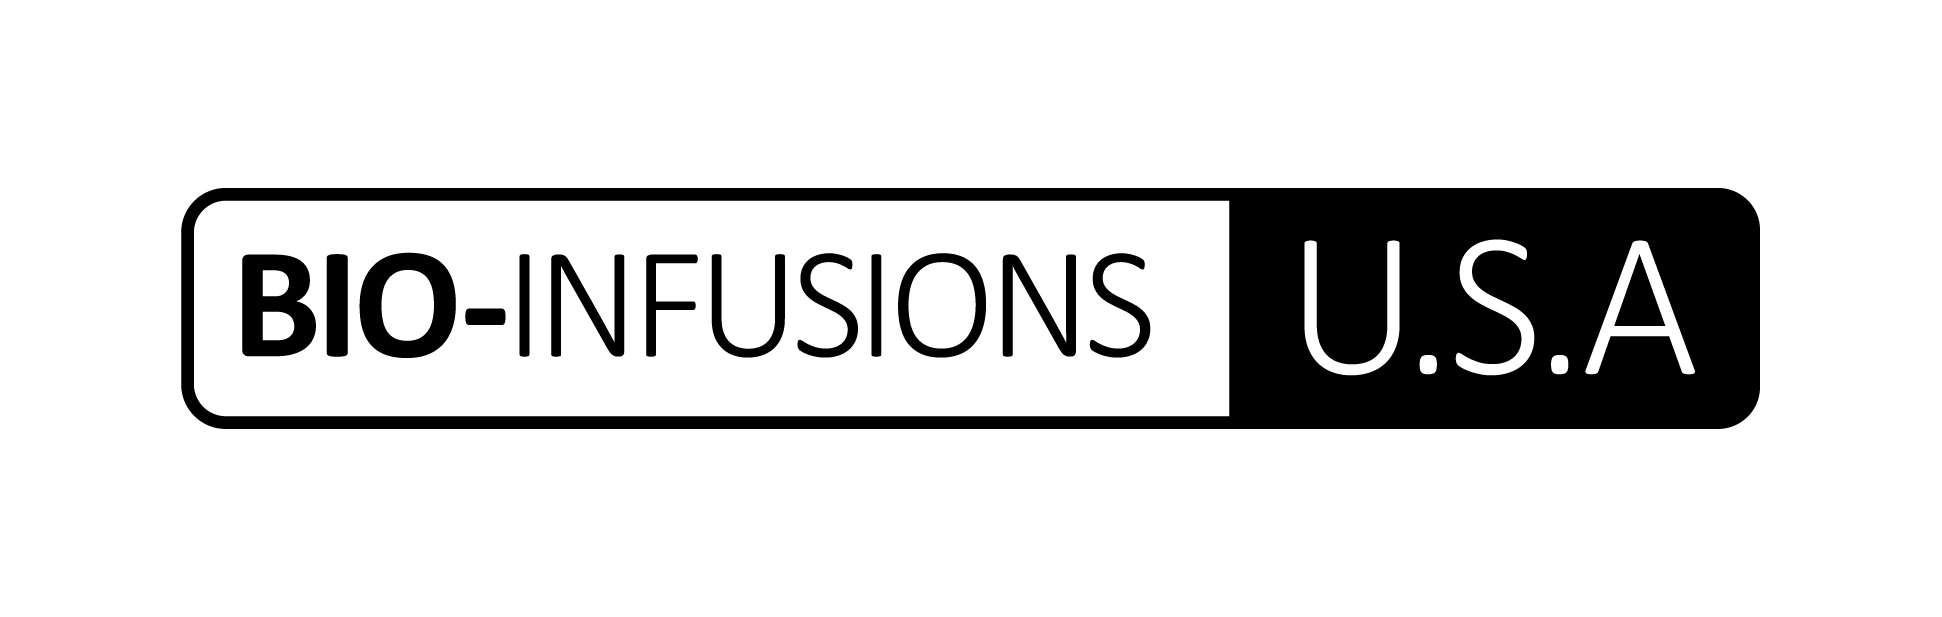 ~     Bio-Infusions USA